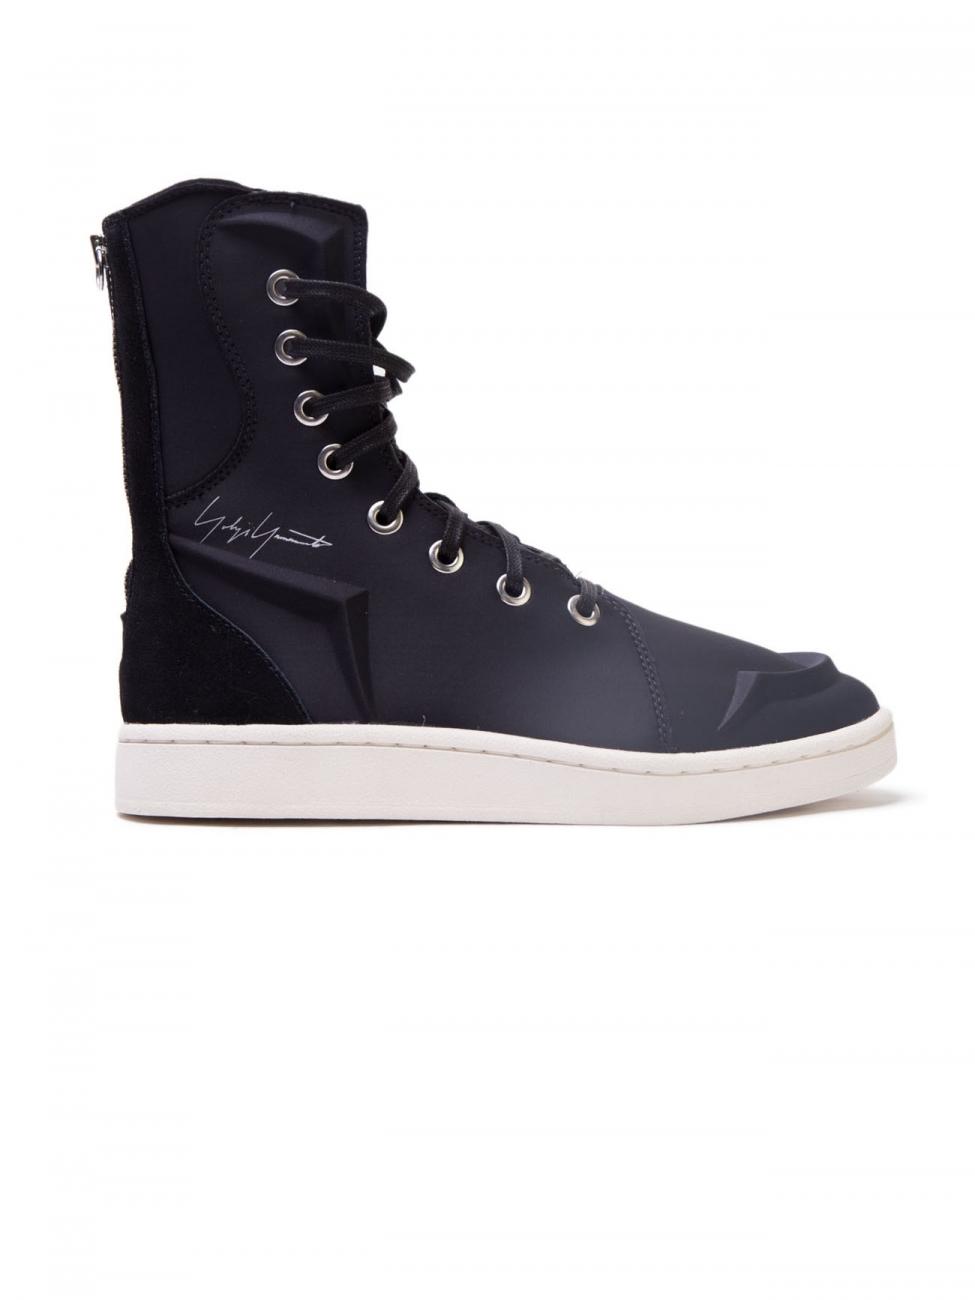 Yohji Yamamoto Black Boxing Boots In Black For Men Lyst